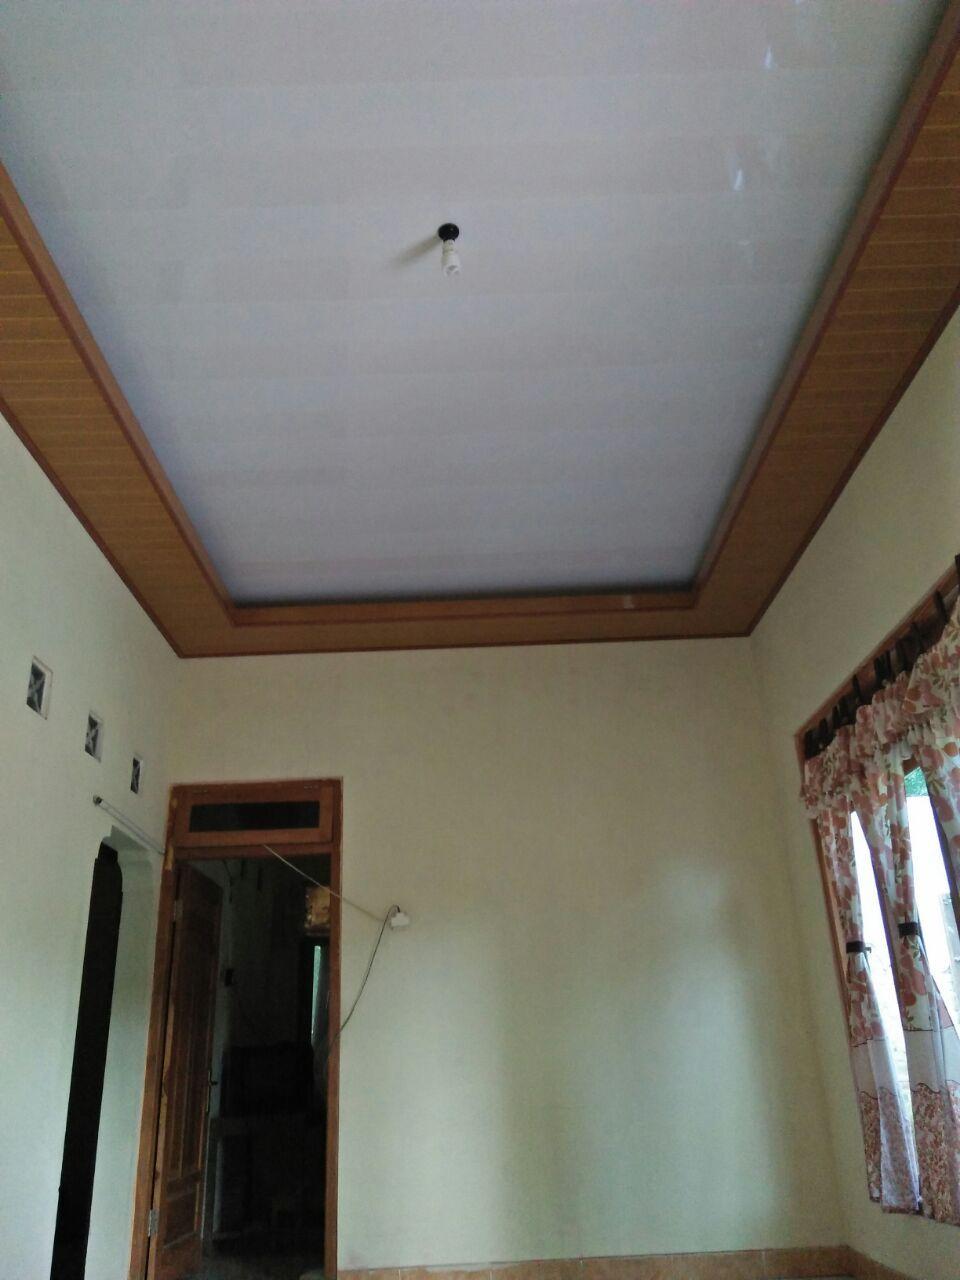 081 376 986 067 plafon  PVC  185 rb untuk plafon  pvc